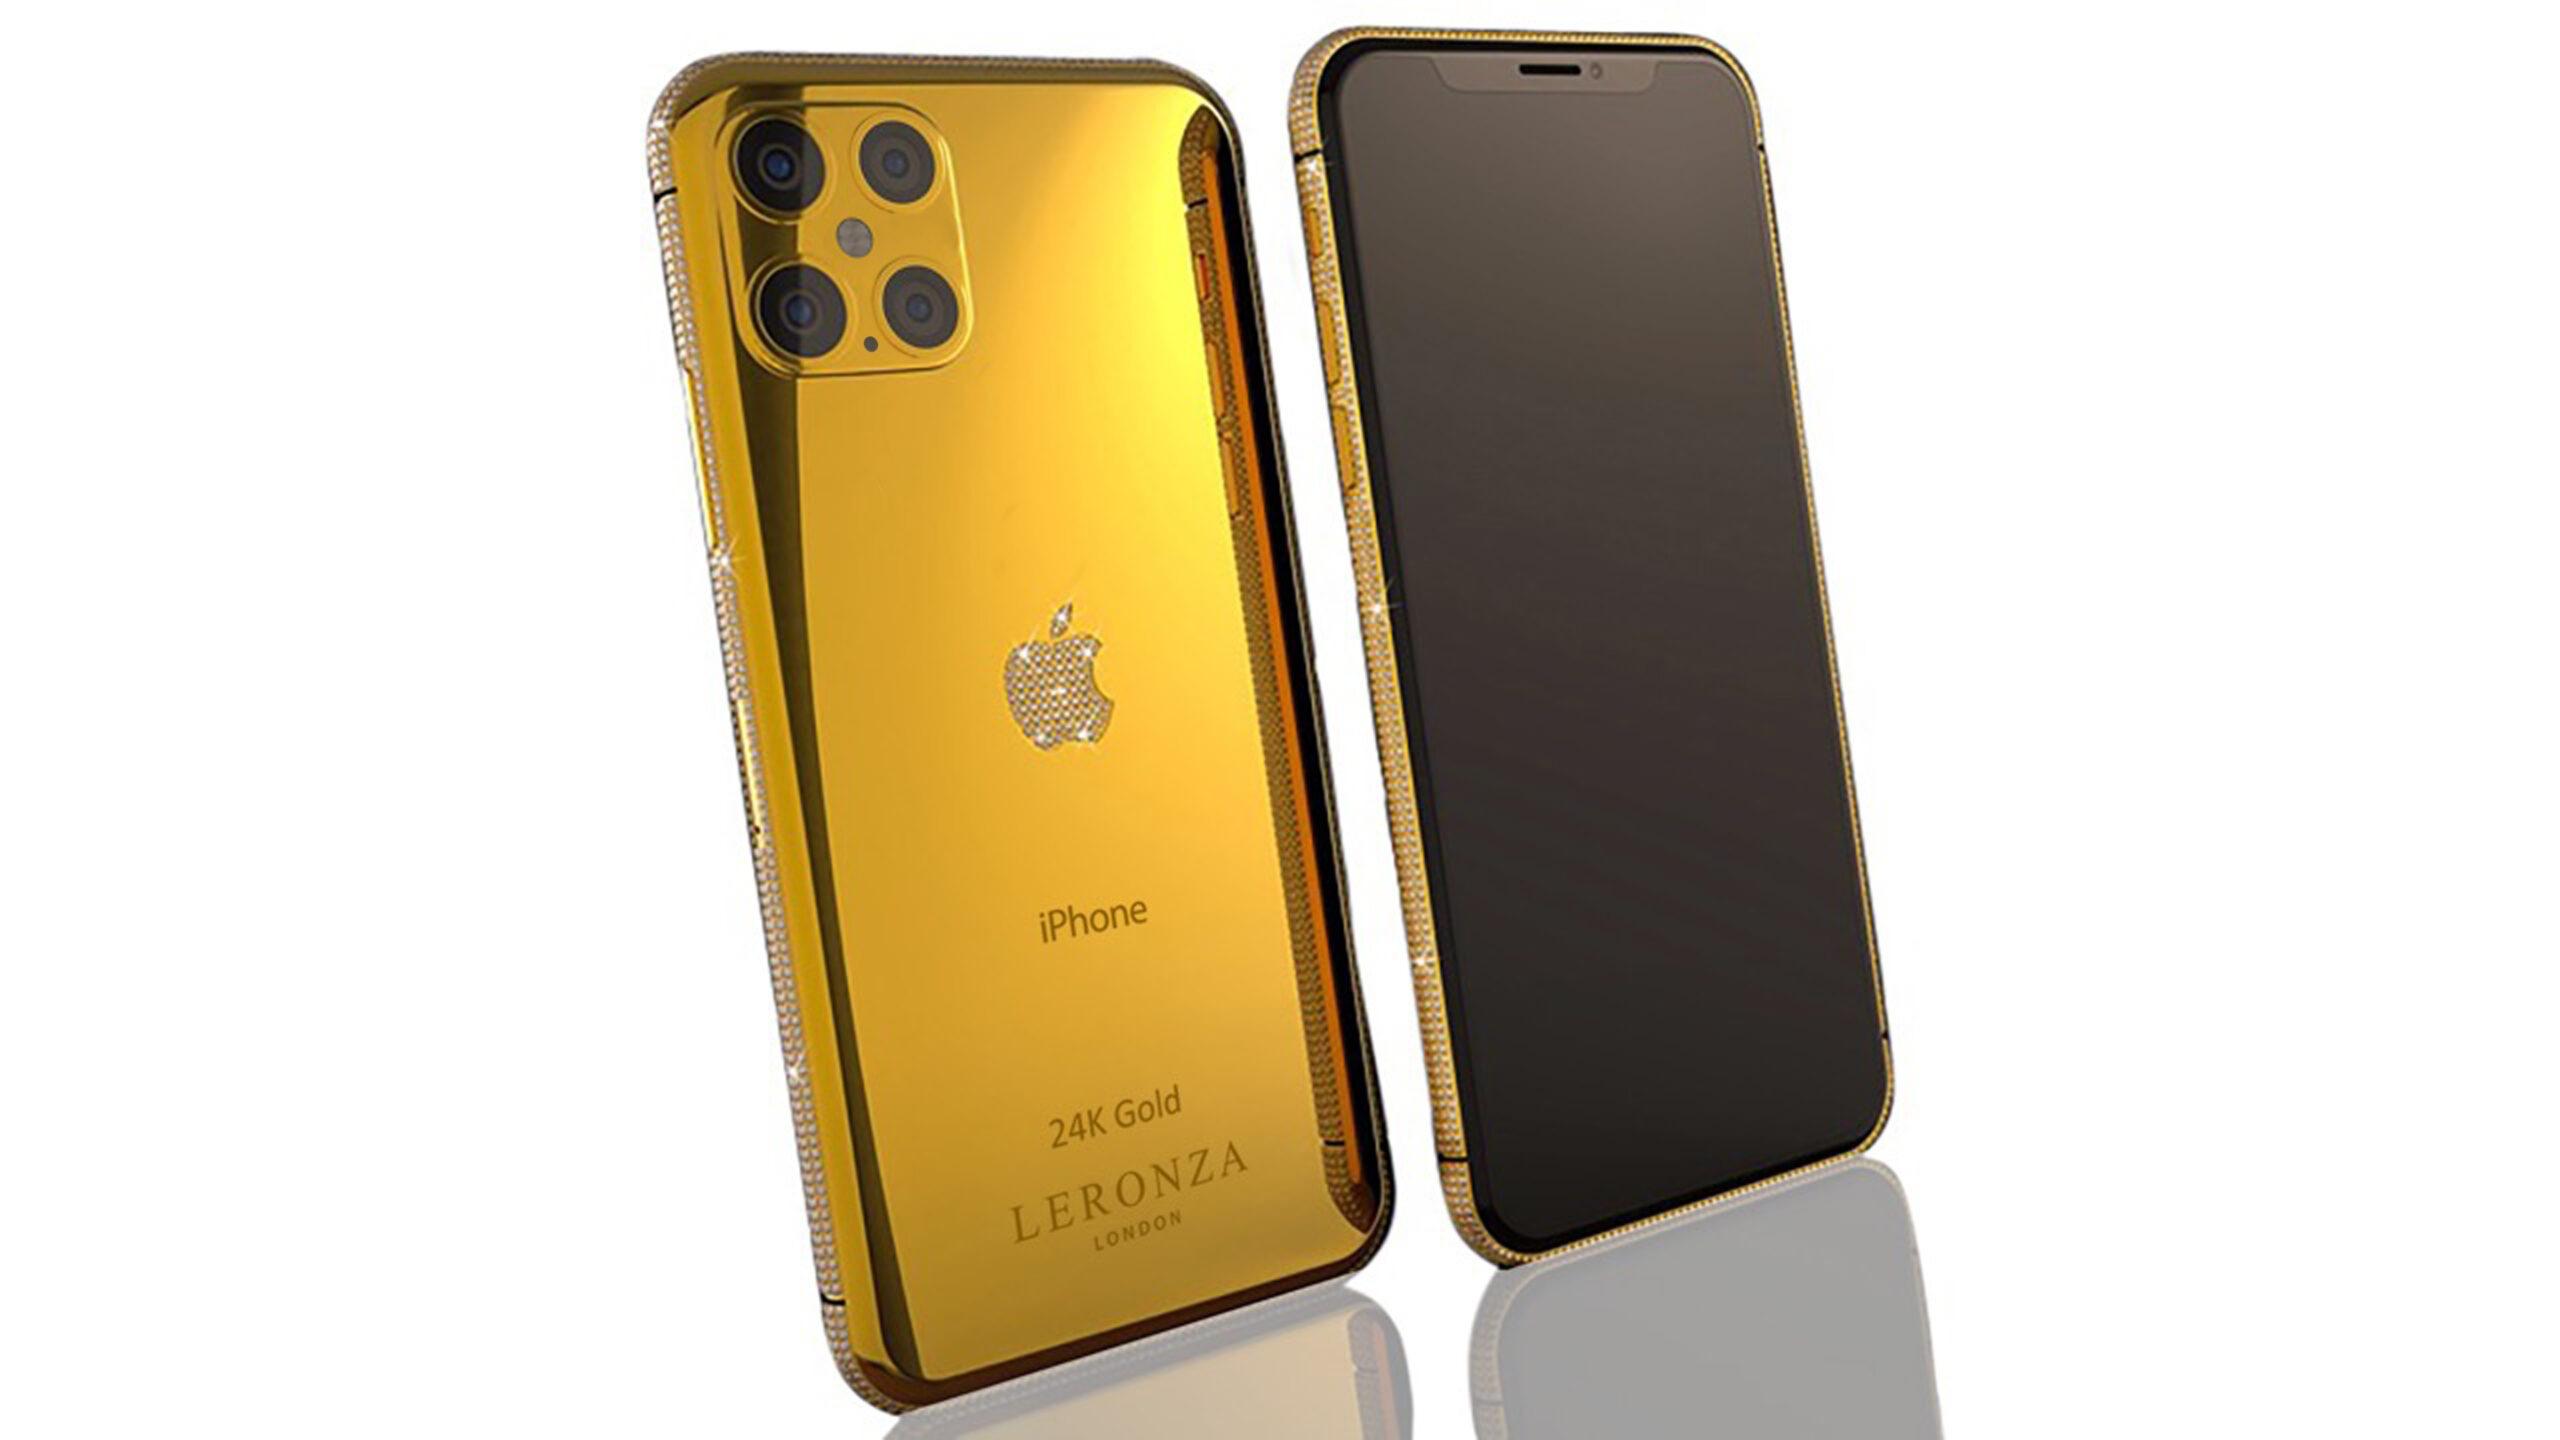 New Luxury 24k Gold Diamond Brilliance Iphone 12 Pro And Max Leronza